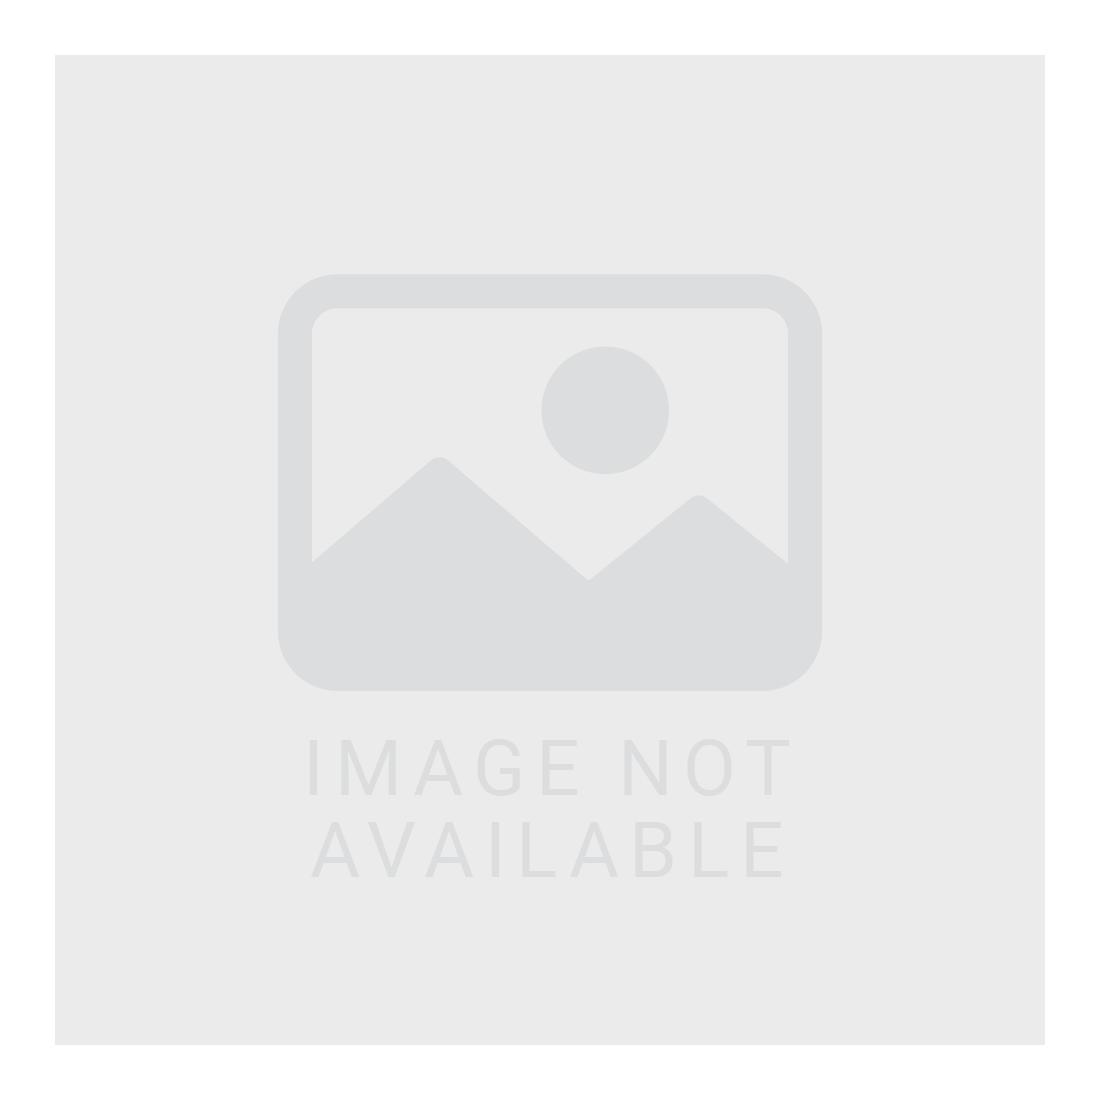 Built to Serve Die Cut Notebook